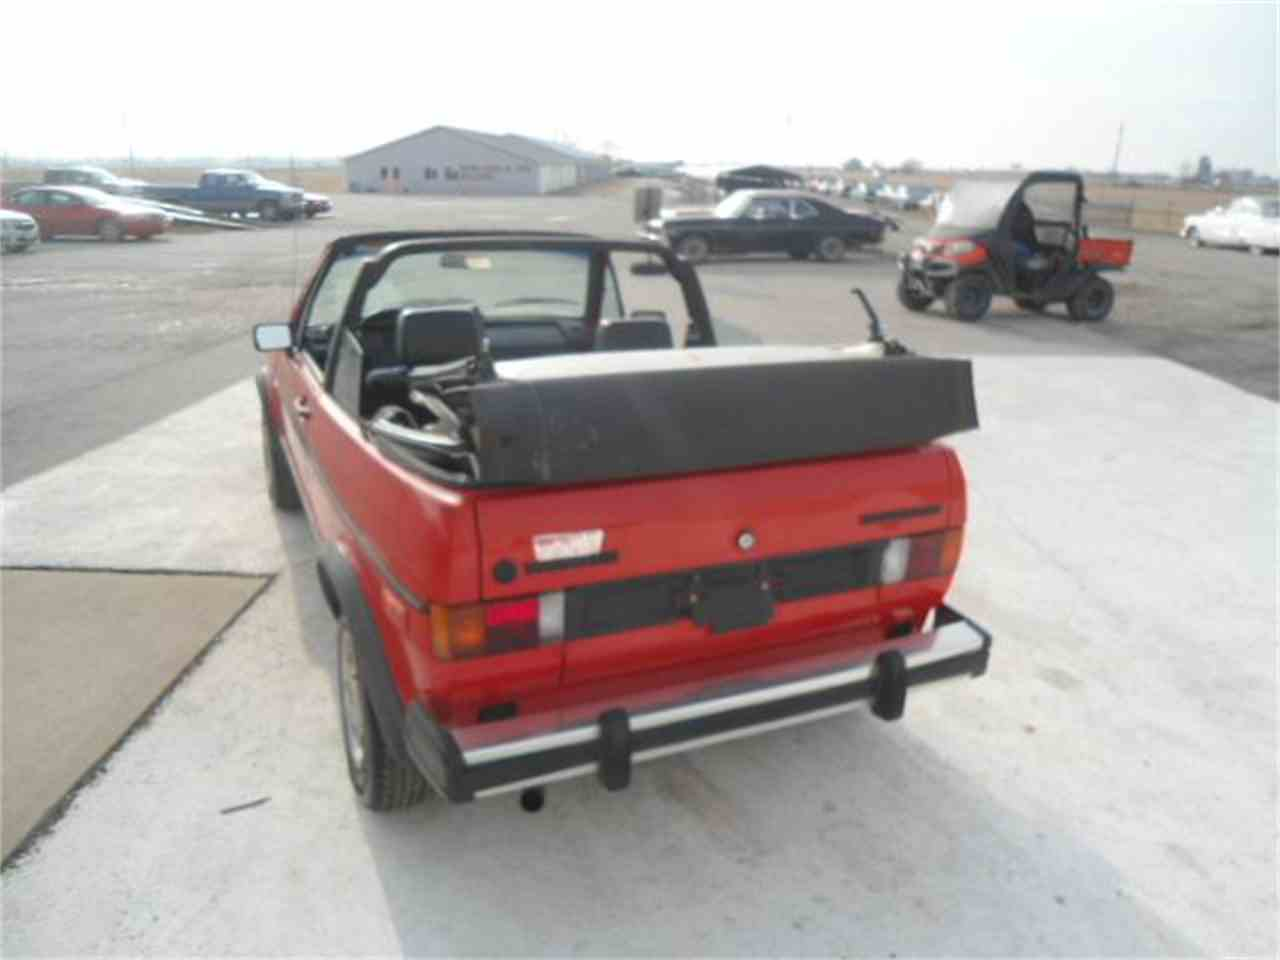 1985 Volkswagen Rabbit For Sale Classiccars Com Cc 938630